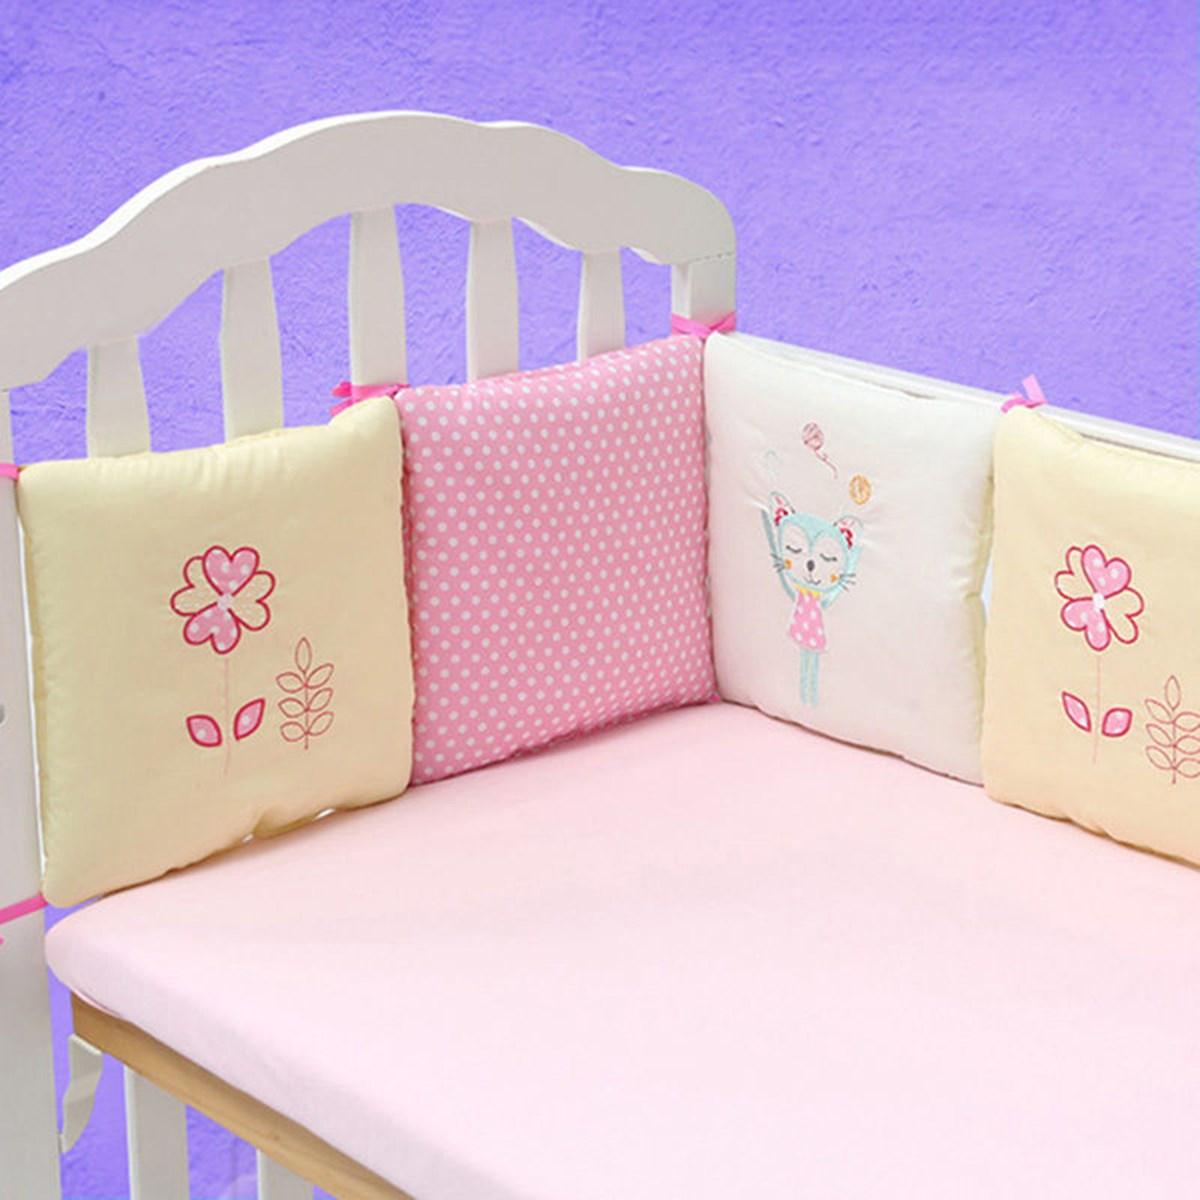 Baby Cot Crib Bumper Safety Cute Bedding Set Life